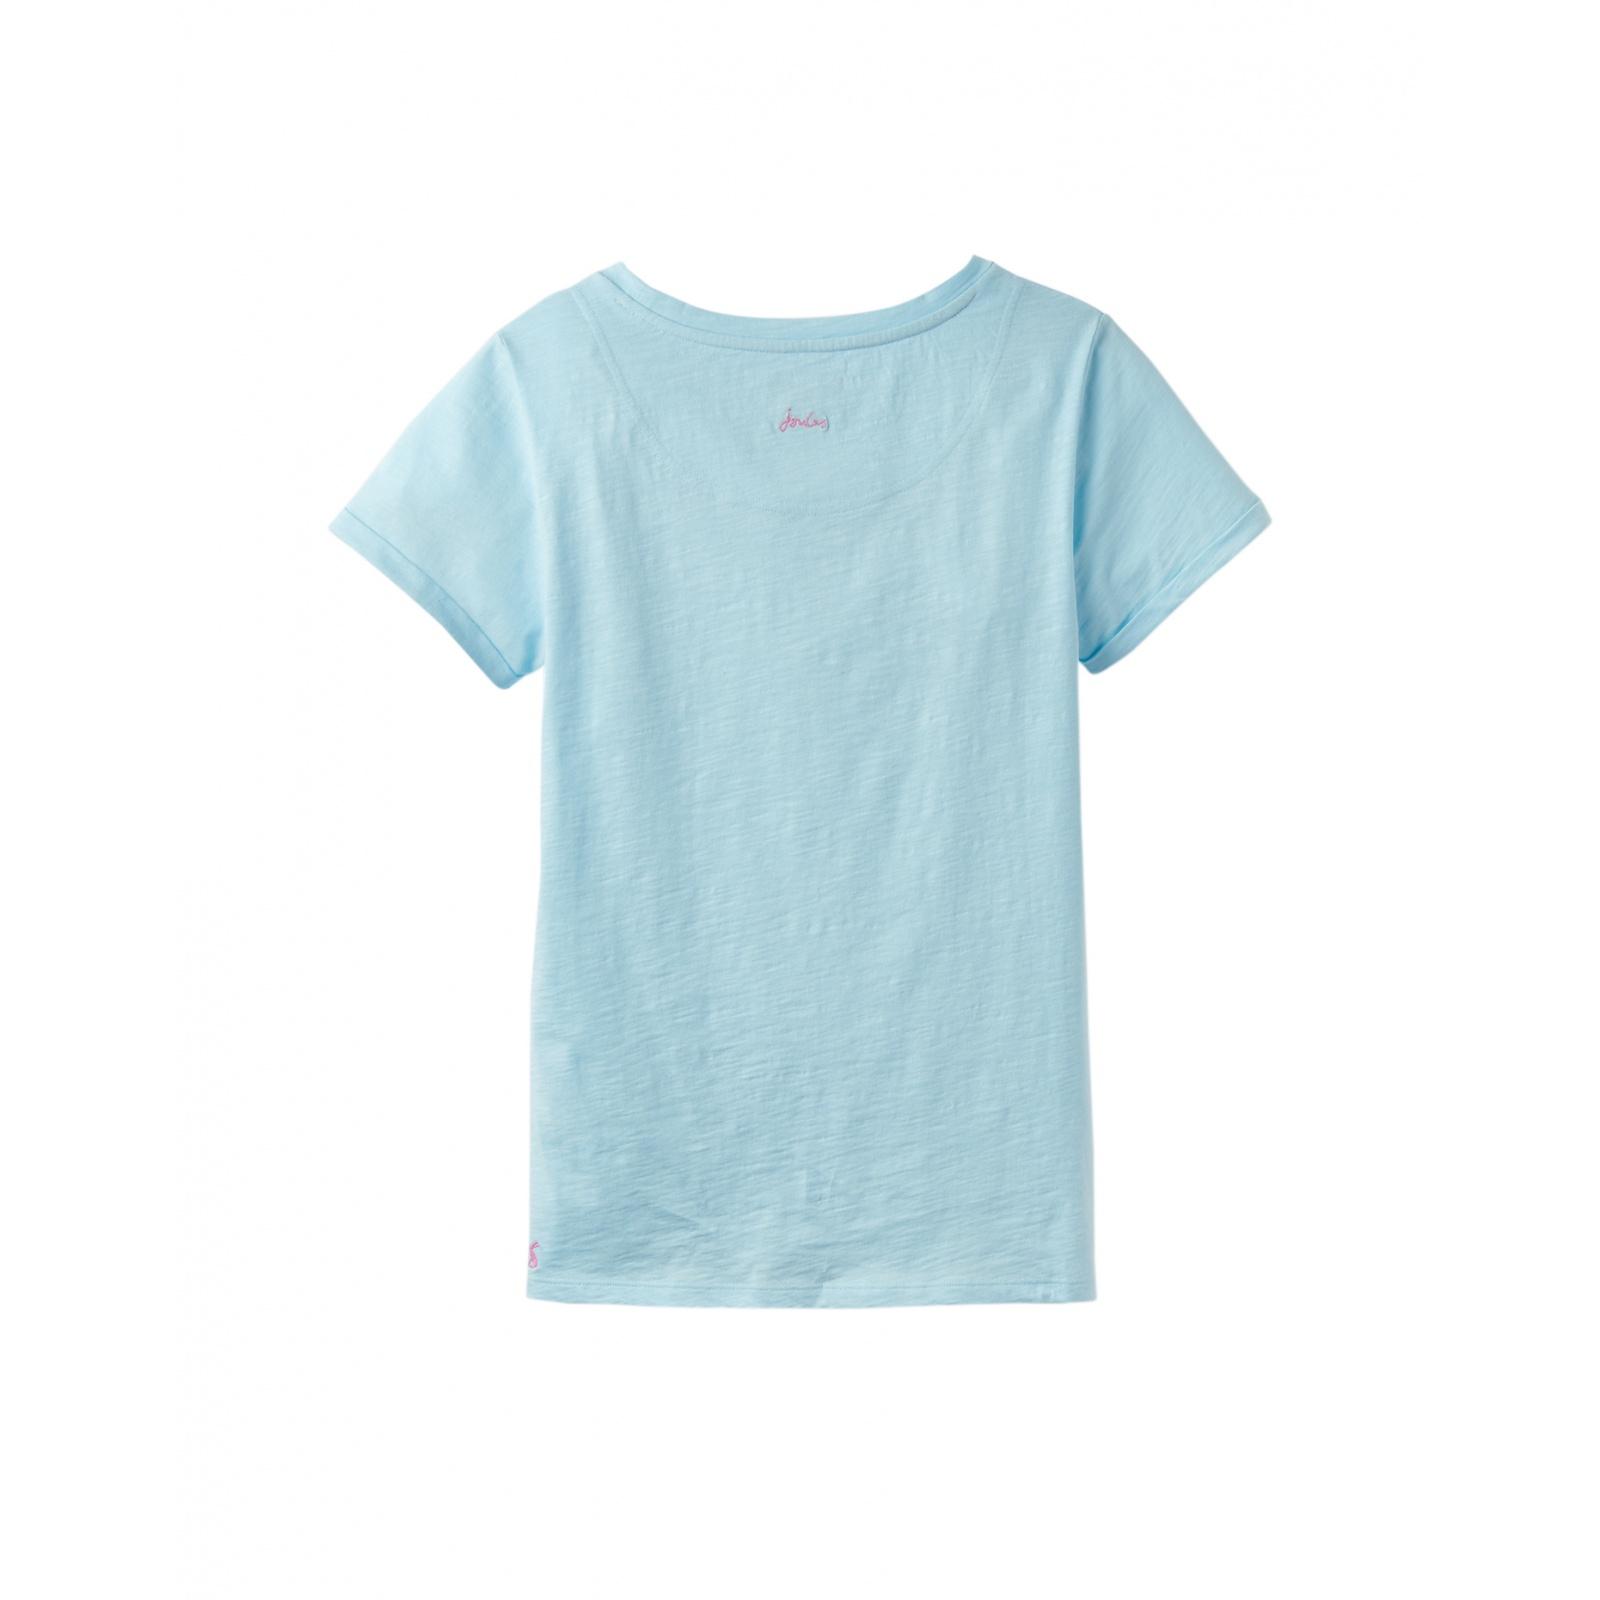 Joules-Nessa-ligero-Jersey-Camiseta-SS19 miniatura 4